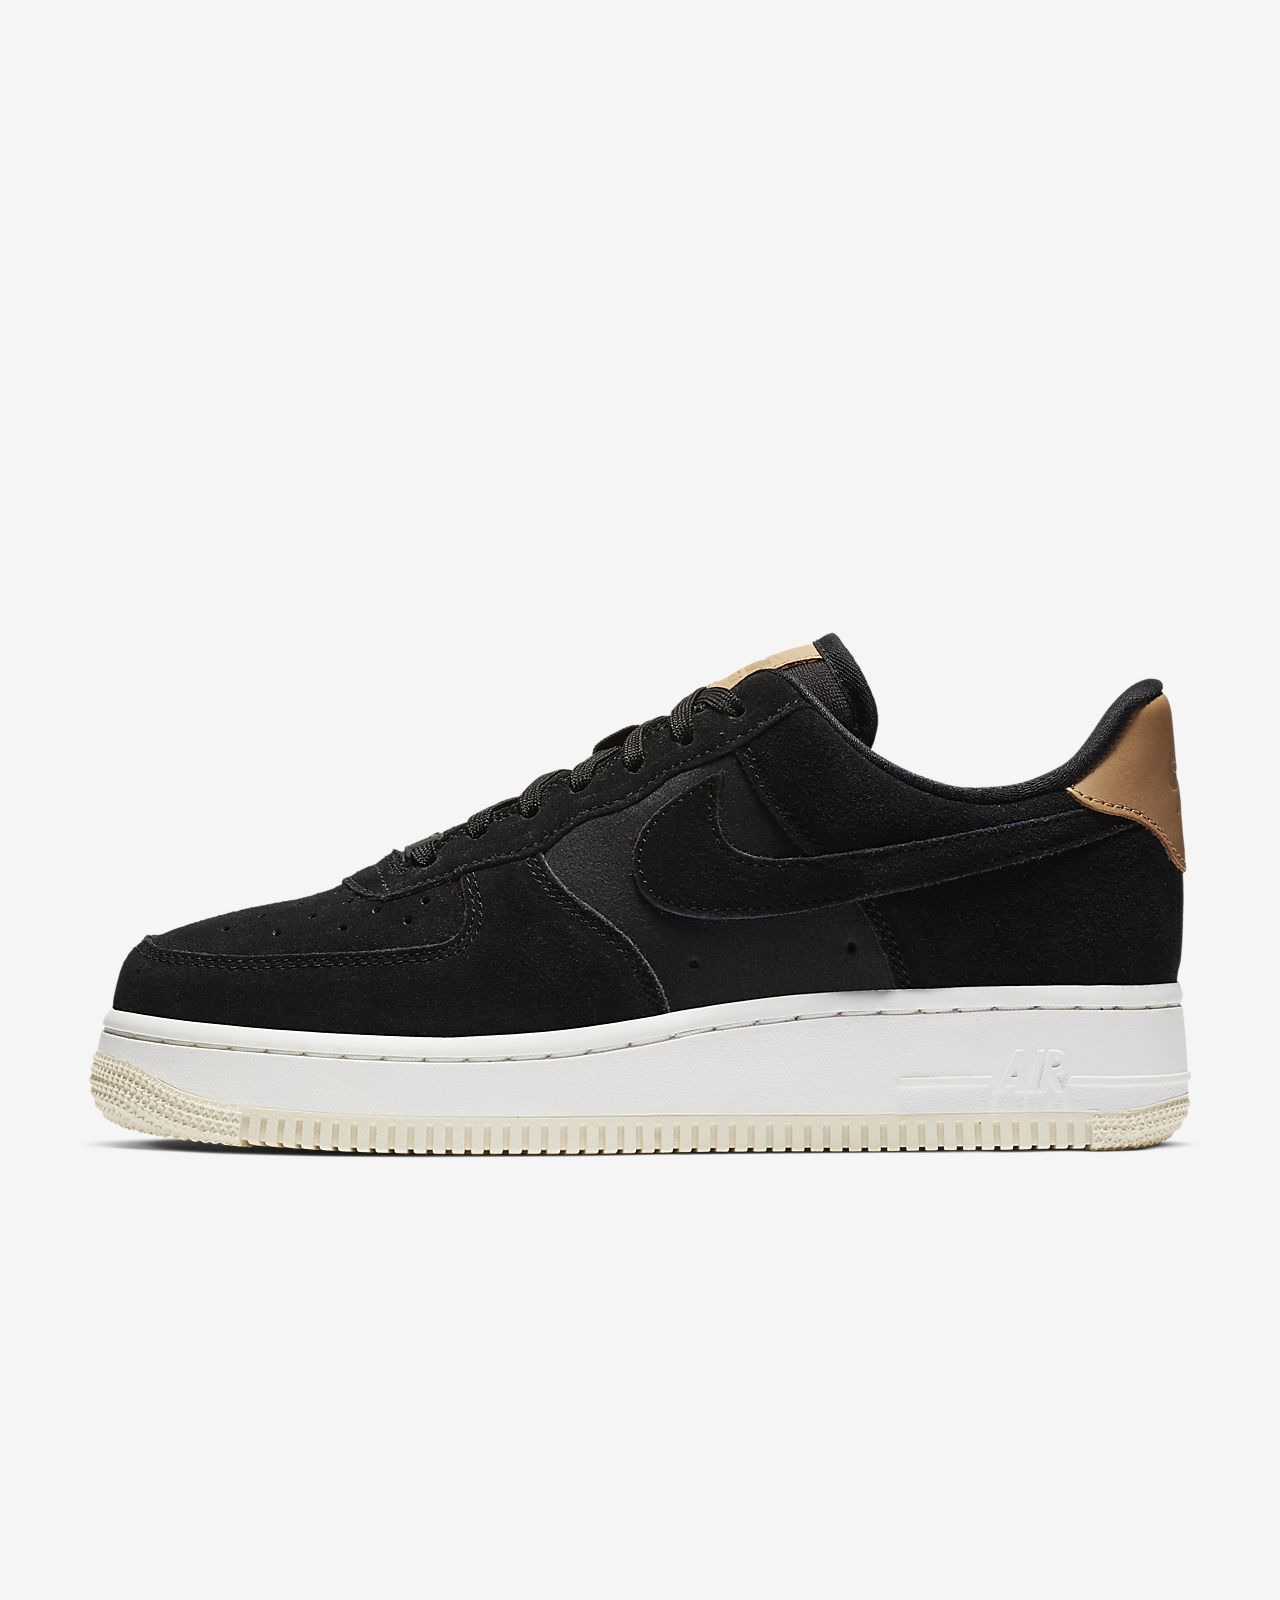 new style 22d56 54f1c Sko Nike Air Force 1 07 Low Premium för kvinnor